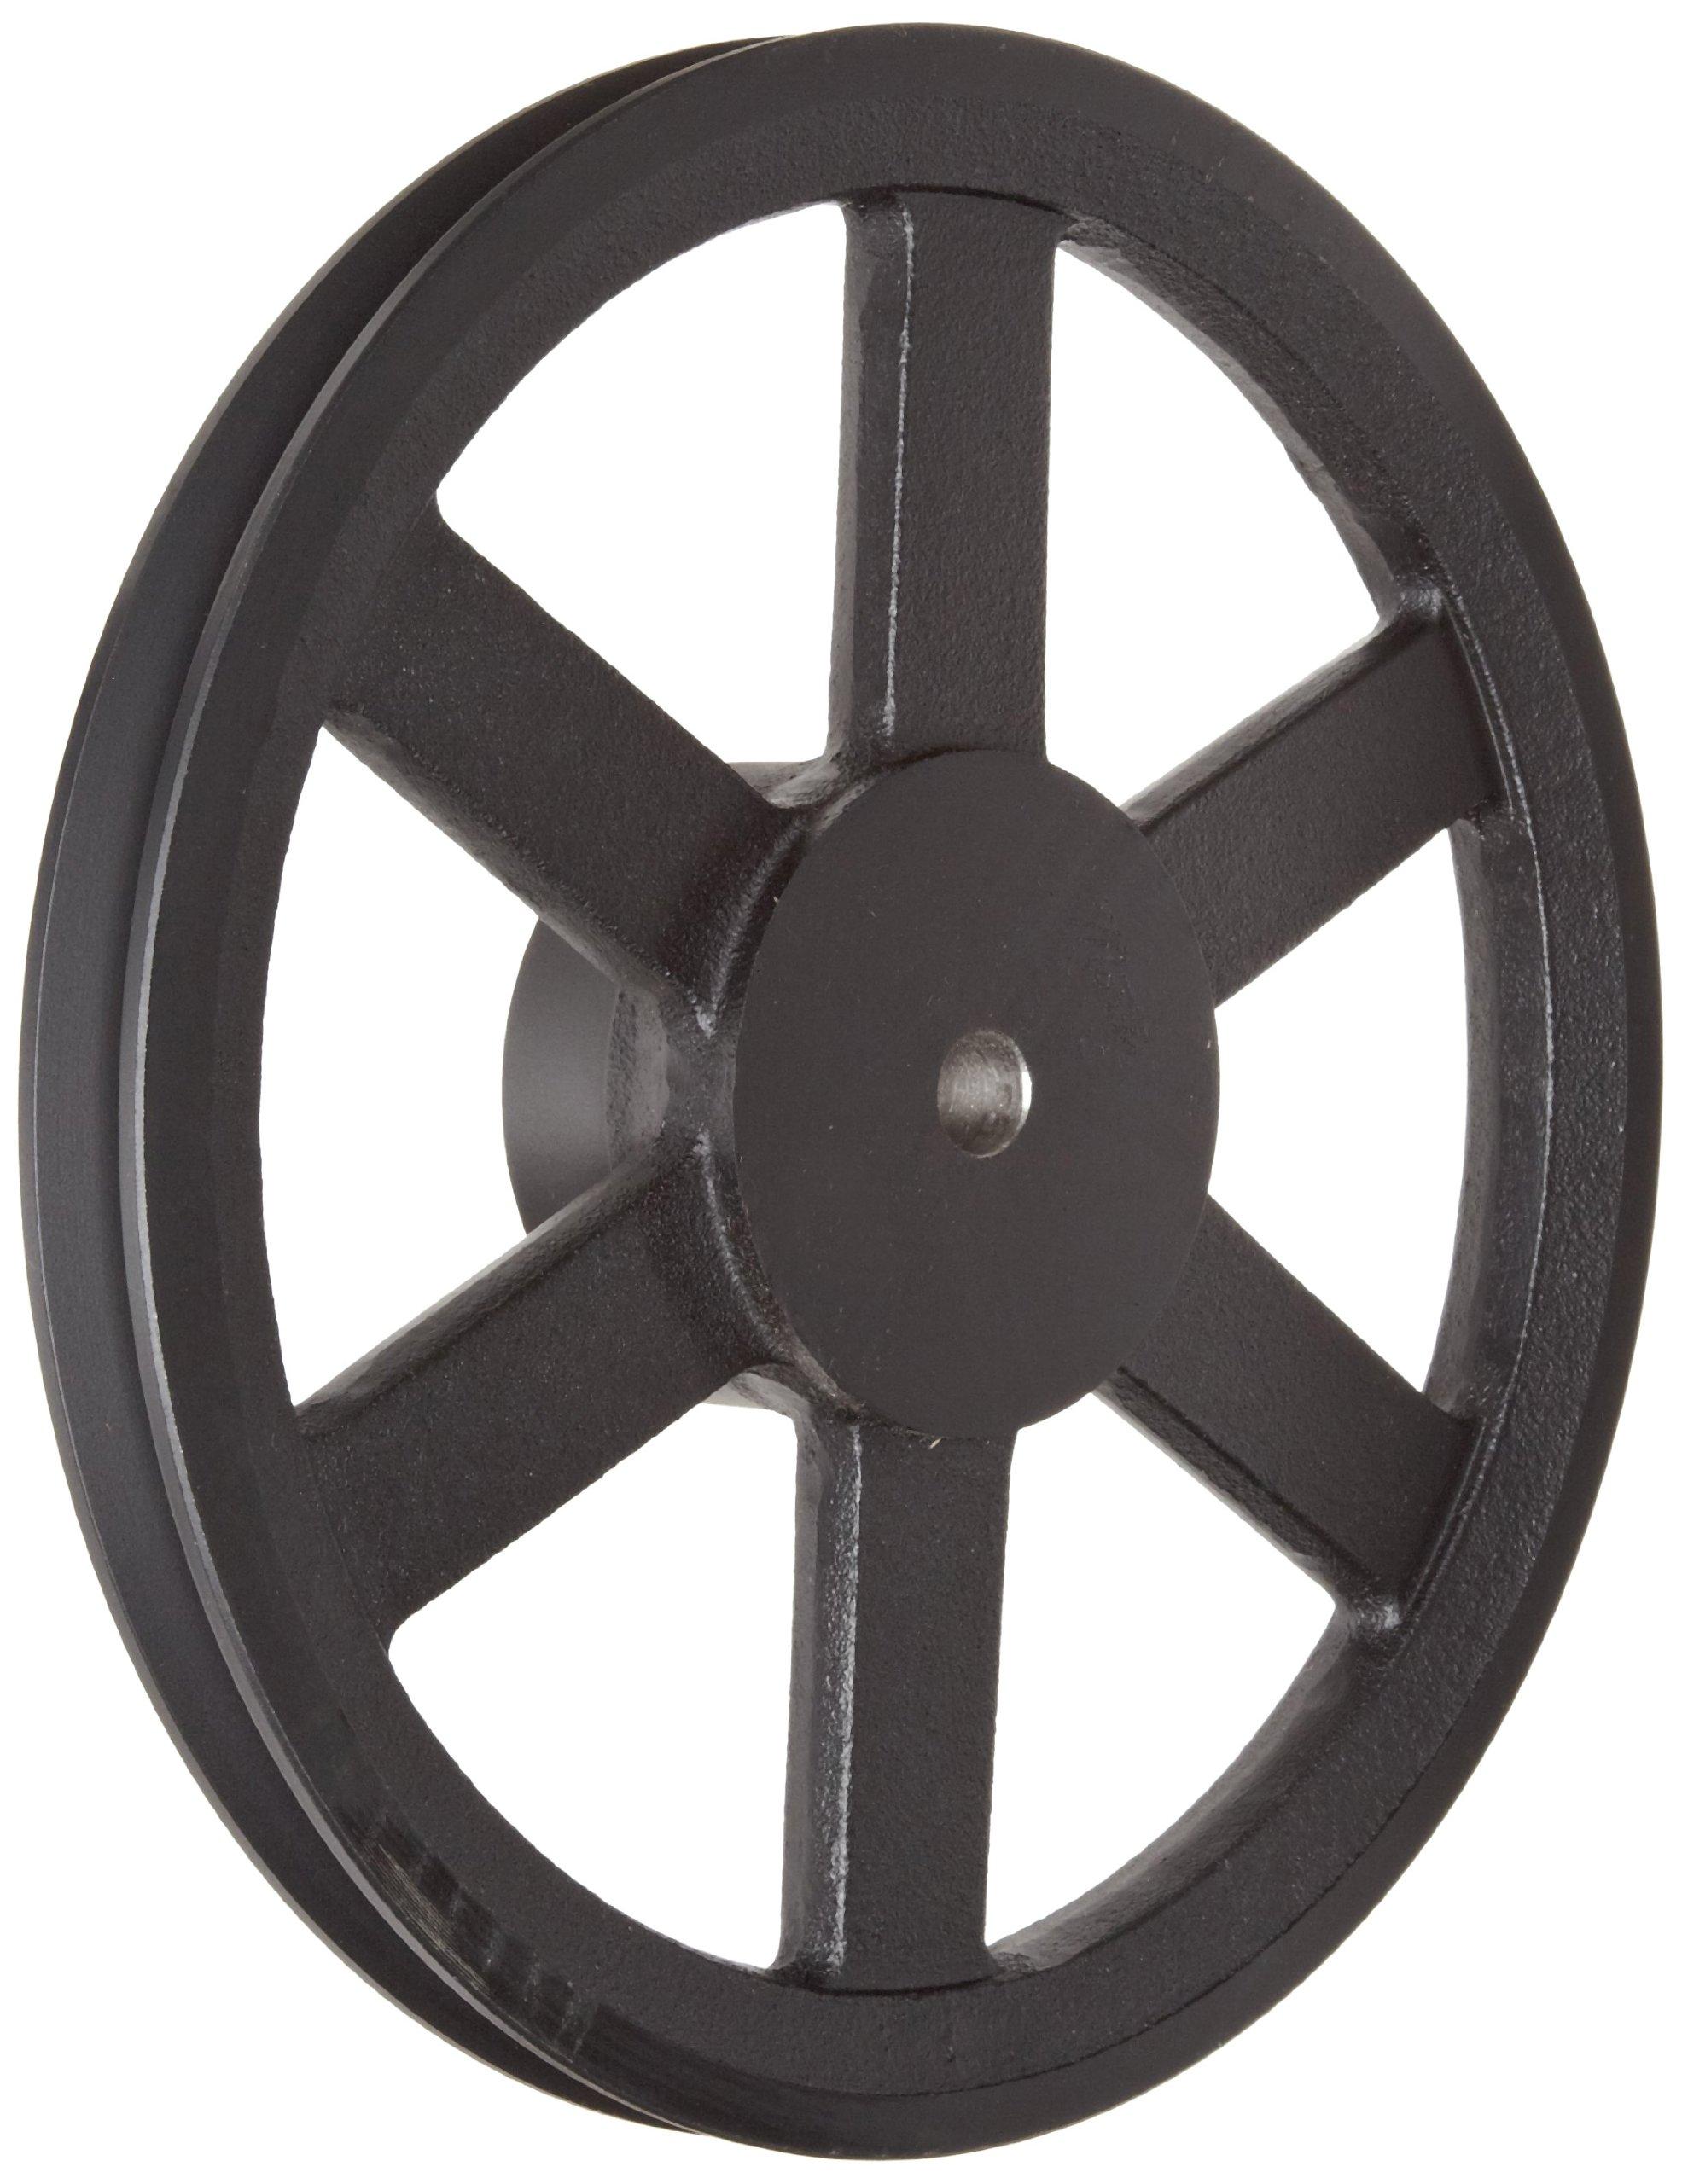 Martin AK89 P/B Plain Bore FHP Sheave, 3L/4L Belt Section, 1 Groove, 1/2'' Bore, Class 30 Gray Cast Iron, 8.75'' OD, 2835 max rpm, 8.16'' Pitch Diameter/8.5 Datum